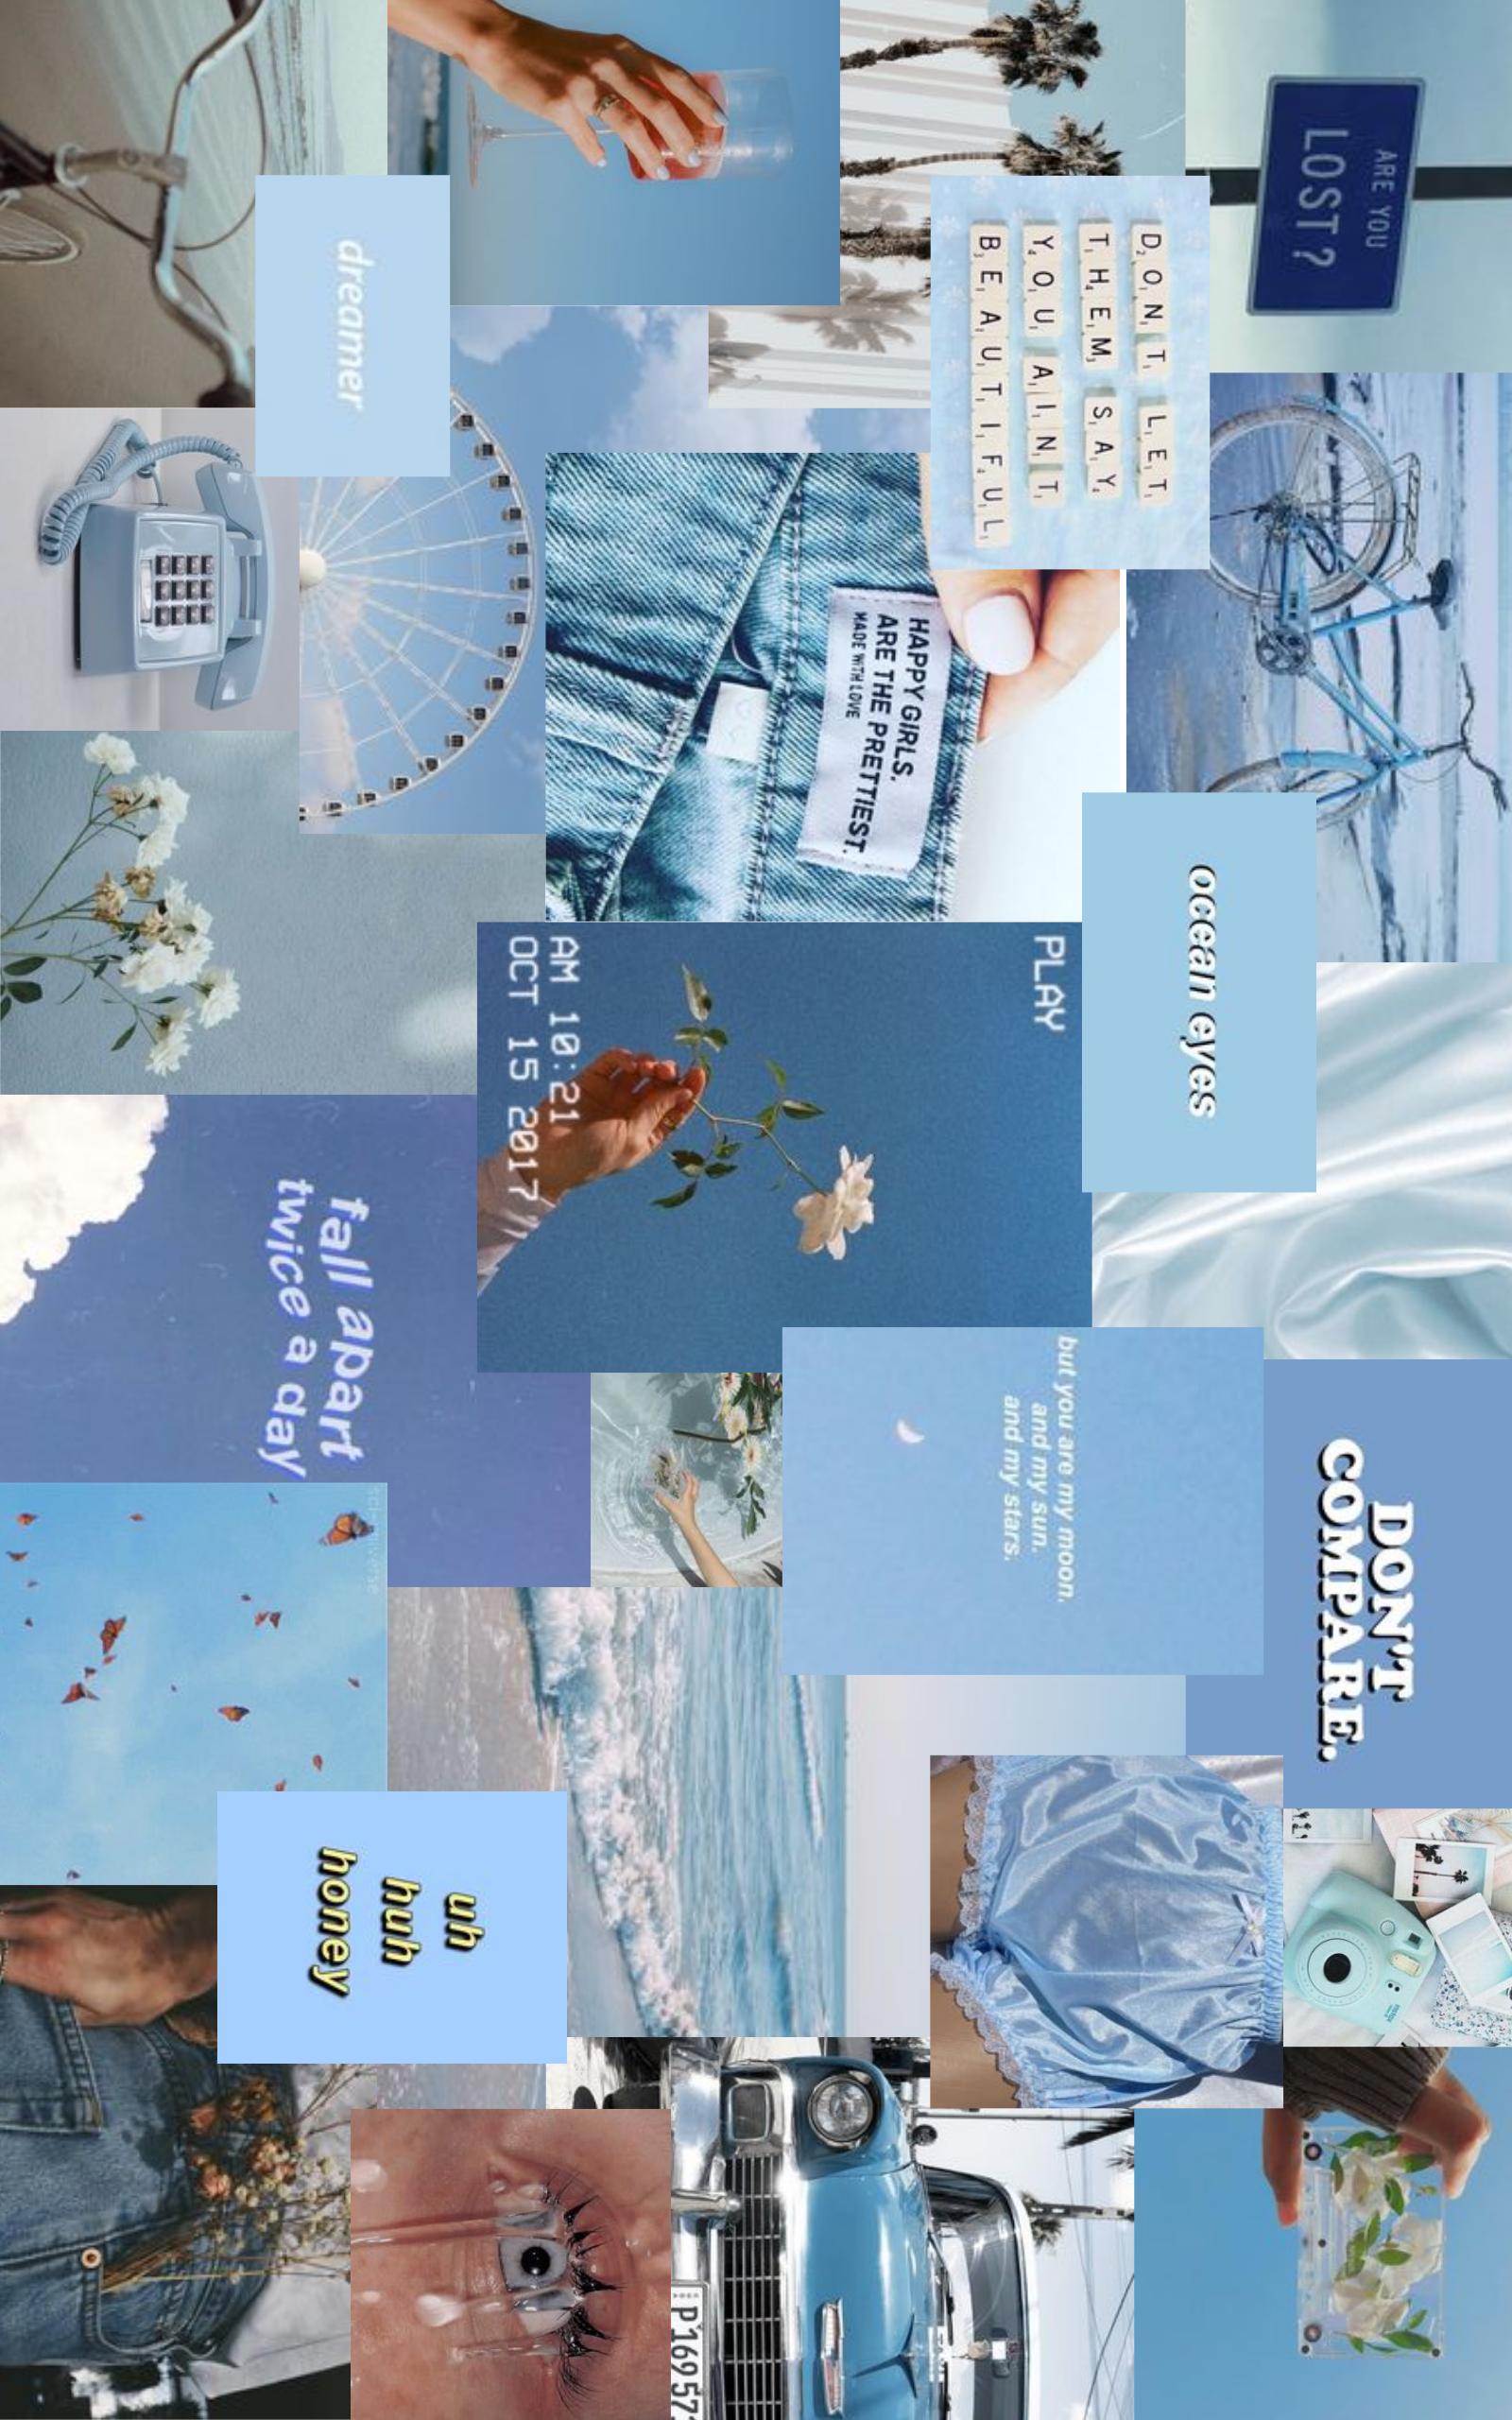 Macbook Air Wallpapers (76+ images)